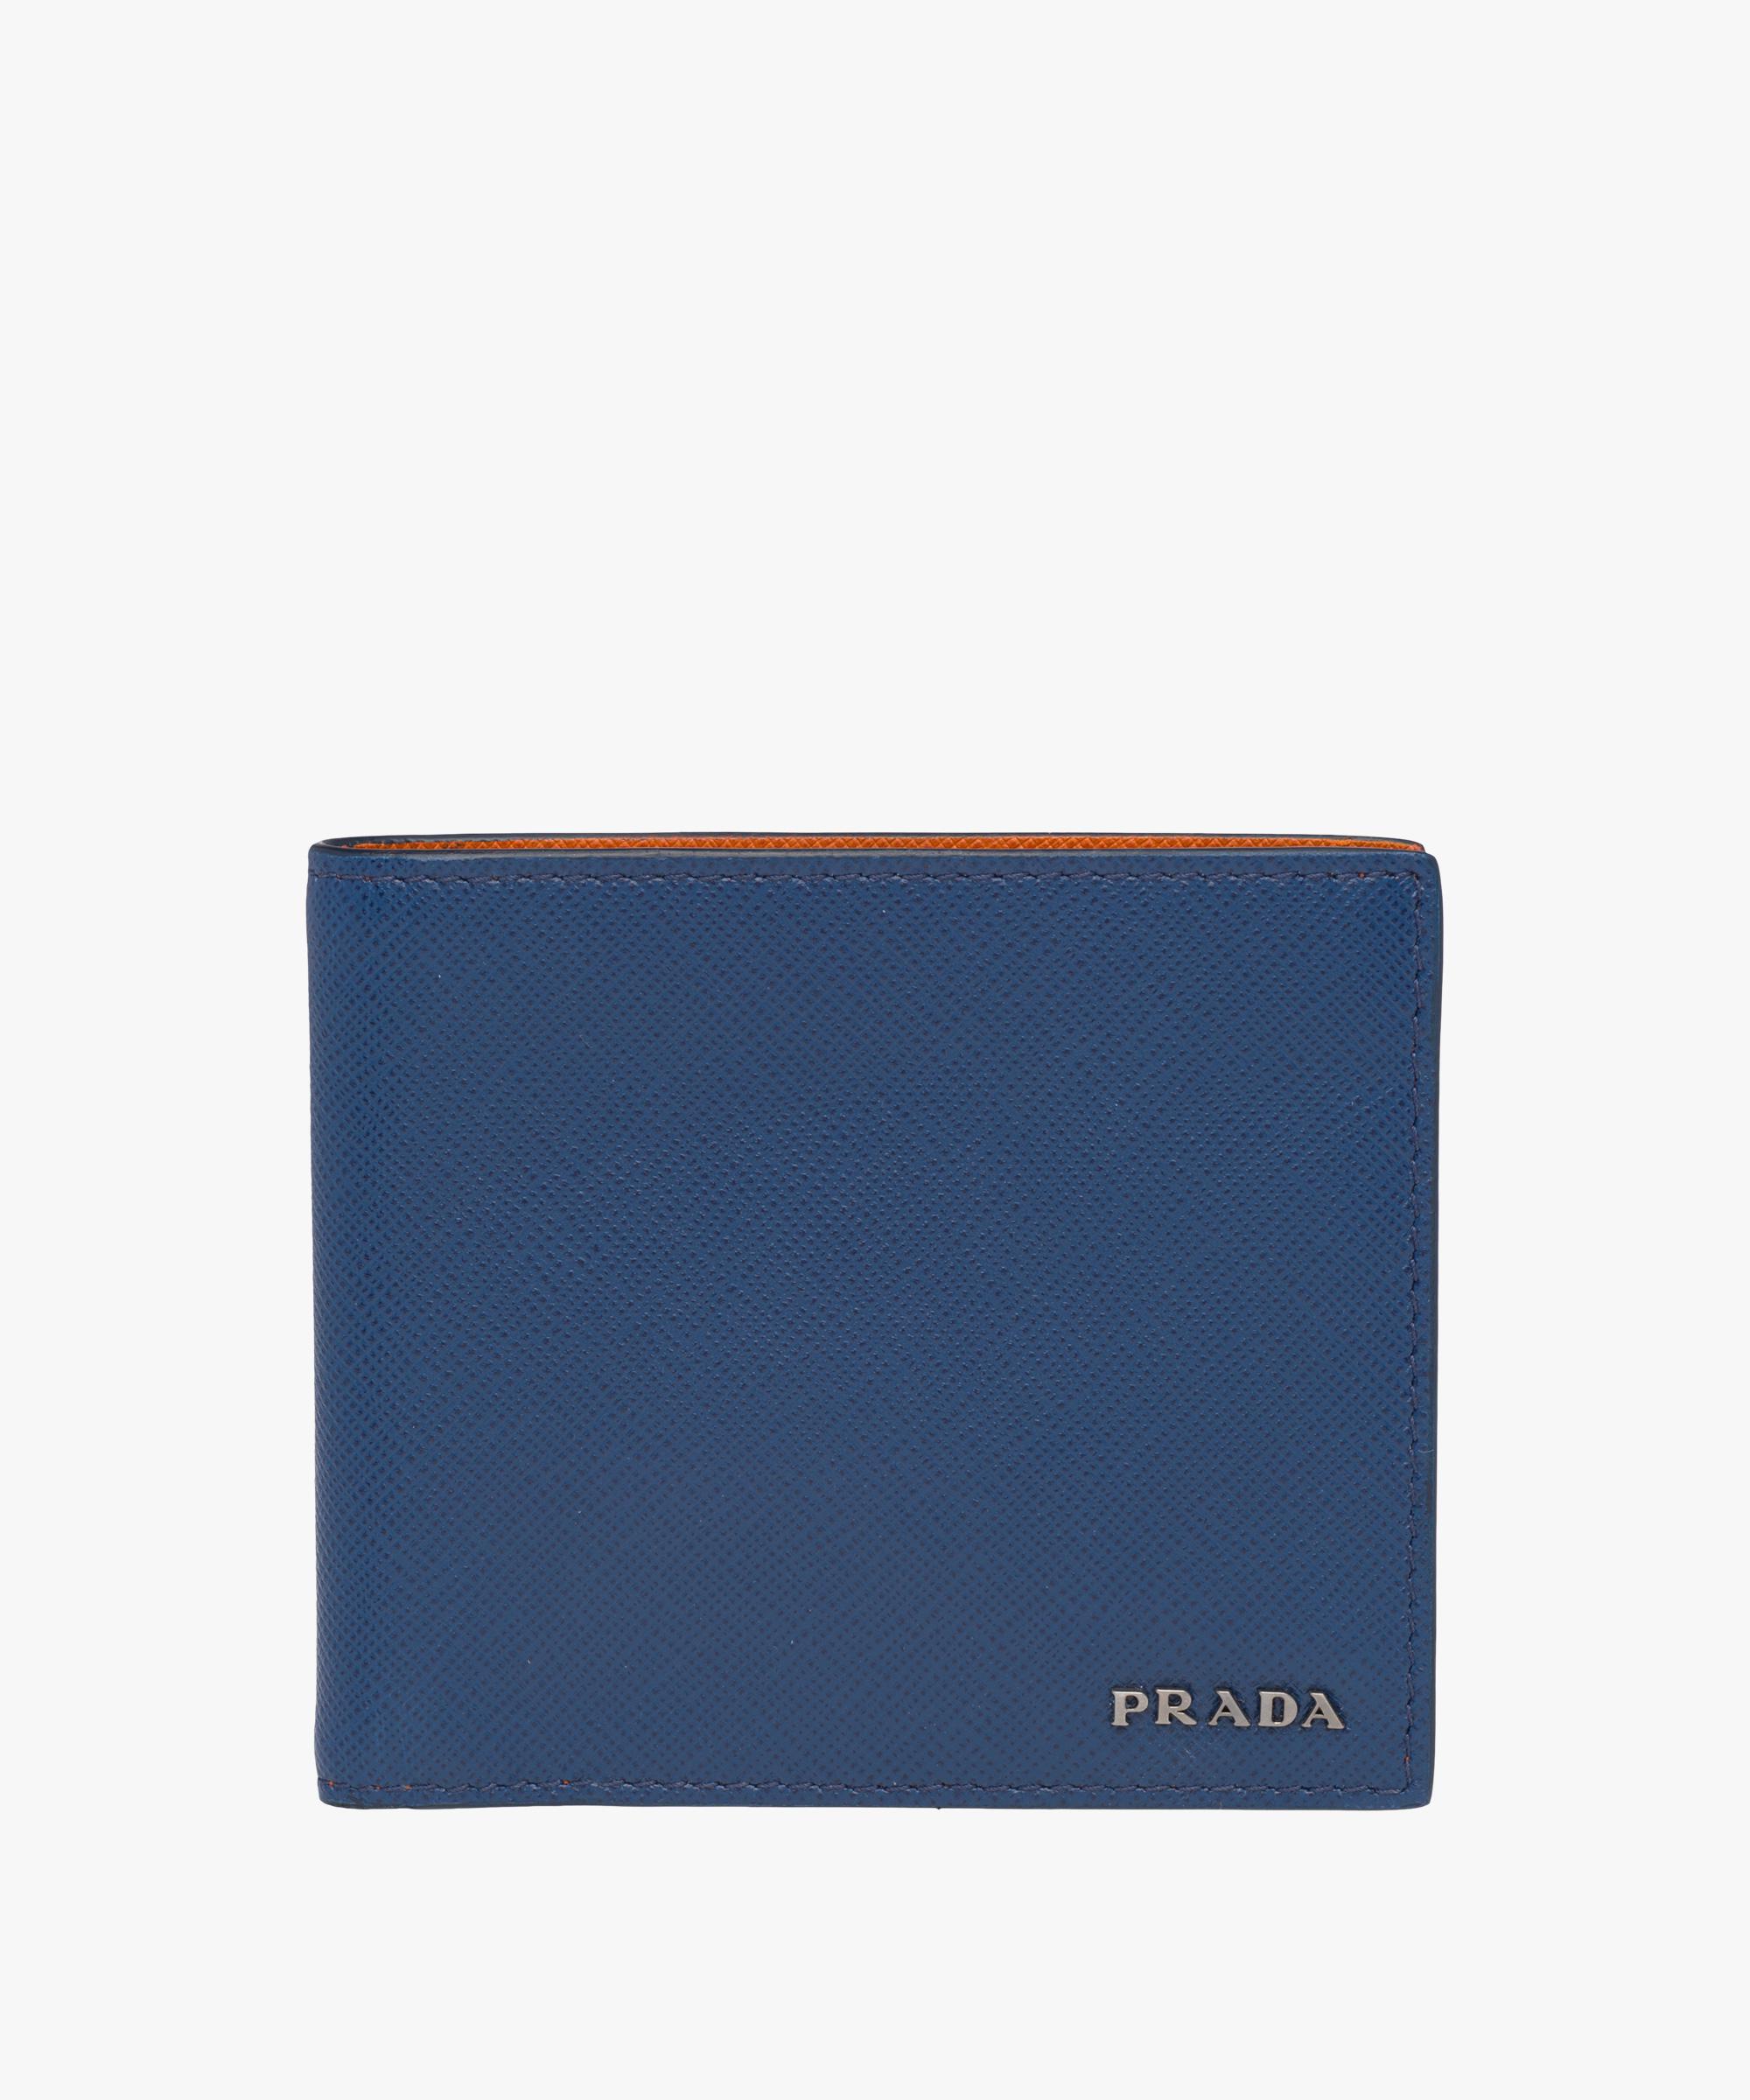 638a318b33c0 Prada Saffiano Leather Wallet in Blue for Men - Lyst